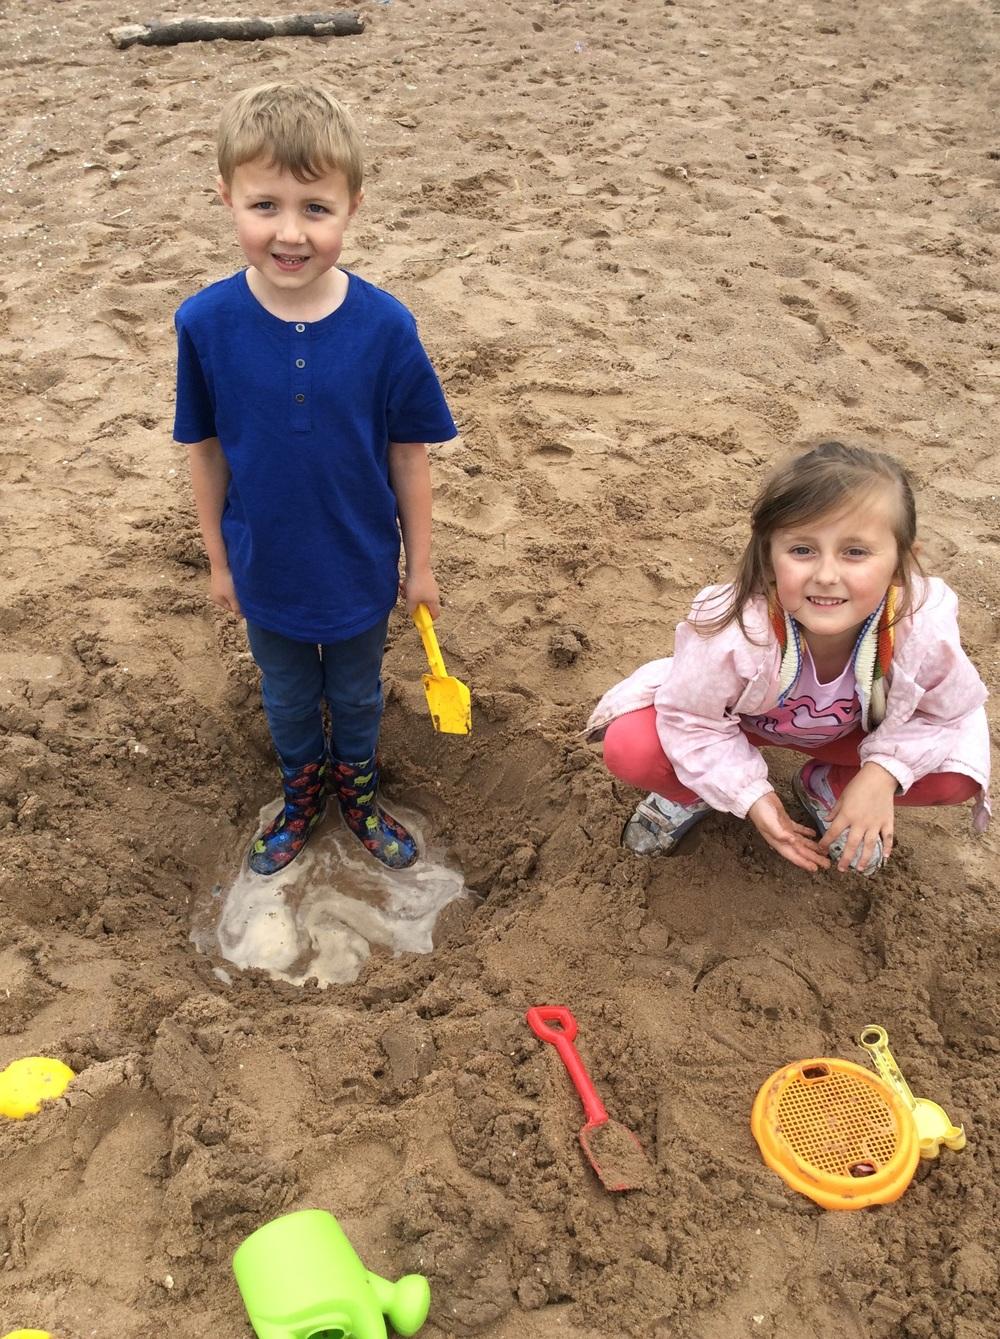 We dug so deep we found water!